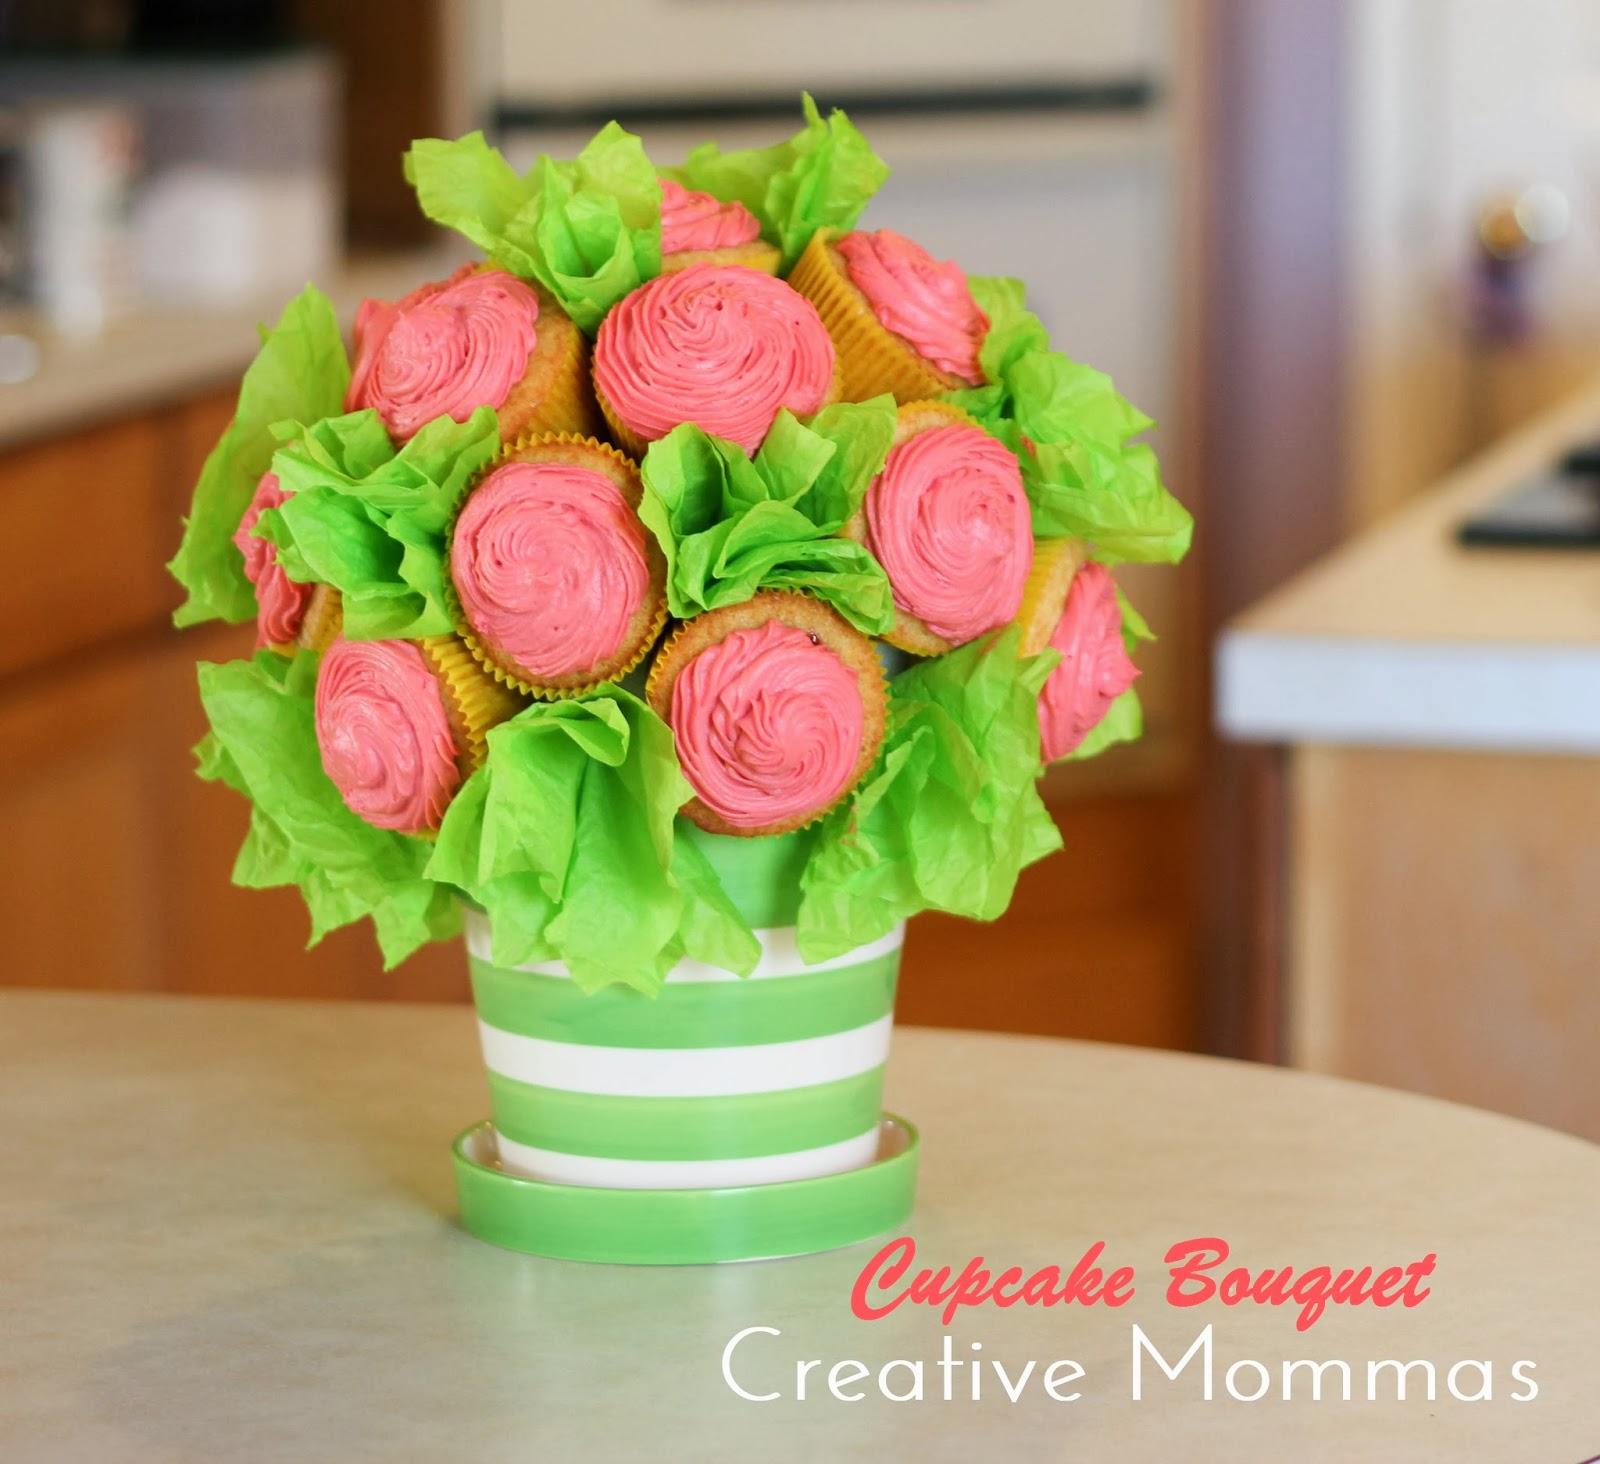 Creative Mommas: Cupcake Bouquet Tutorial